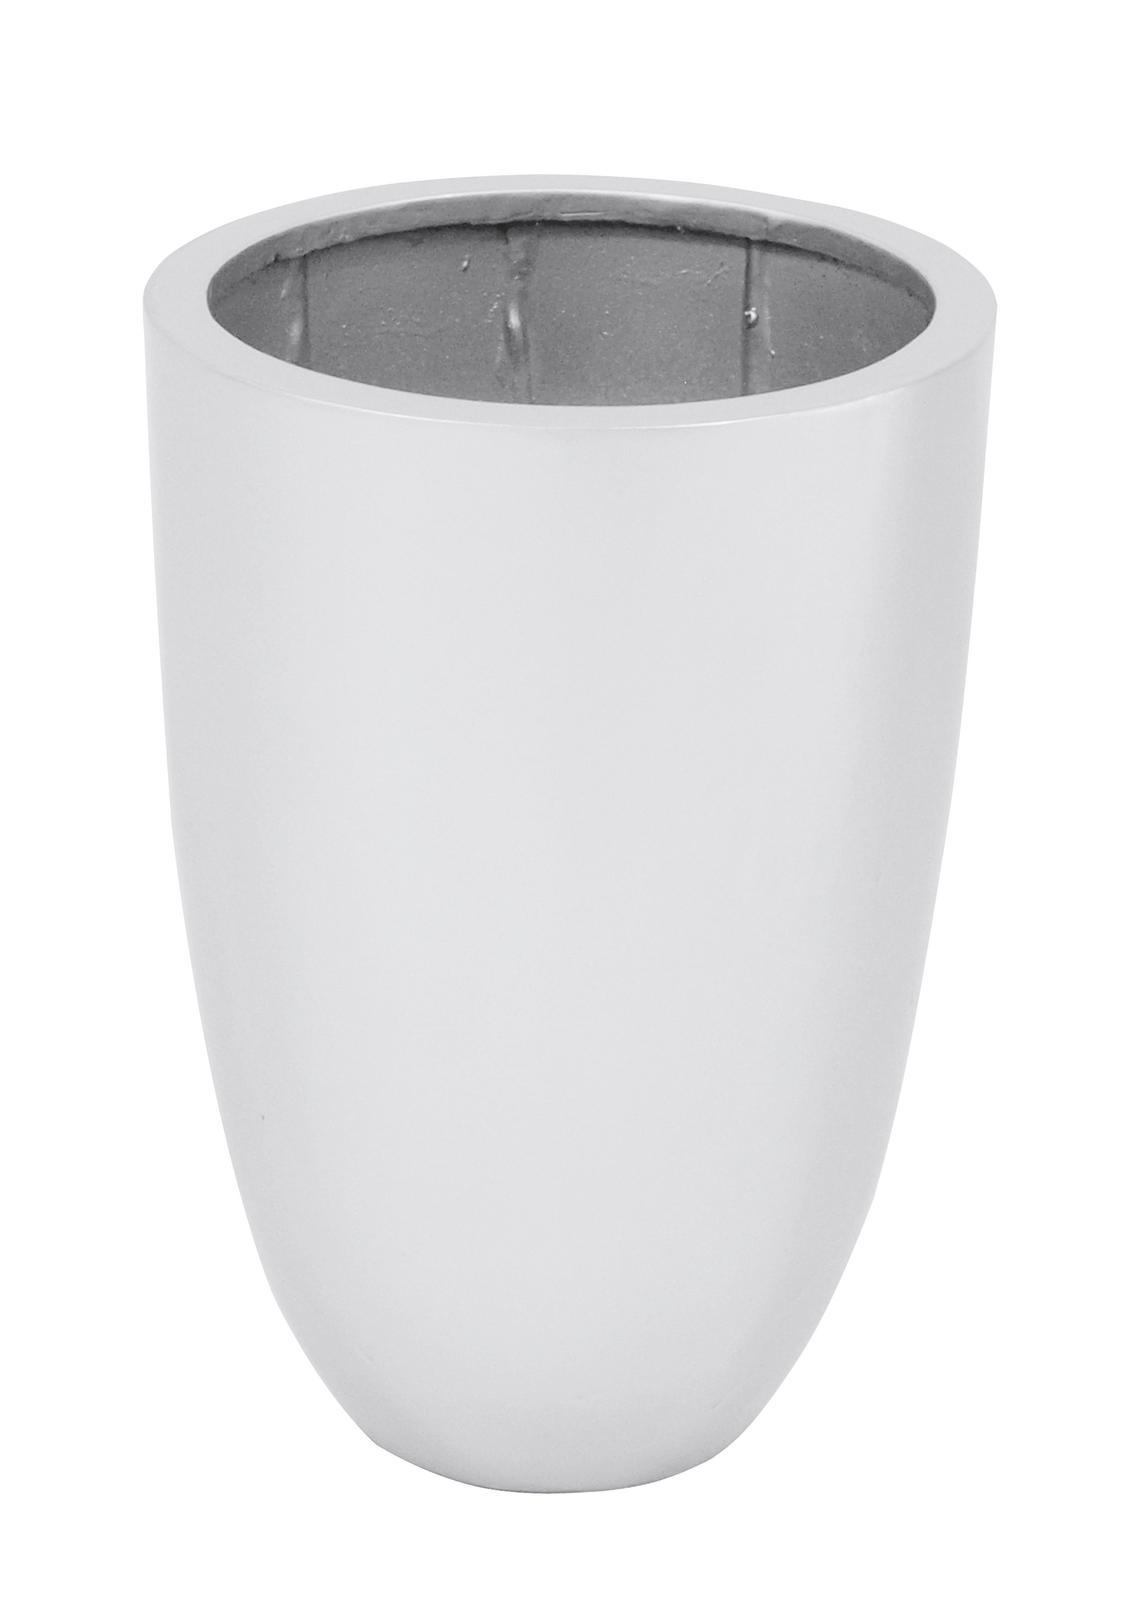 EUROPALMS LEICHTSIN CUP-49, lucido-argento